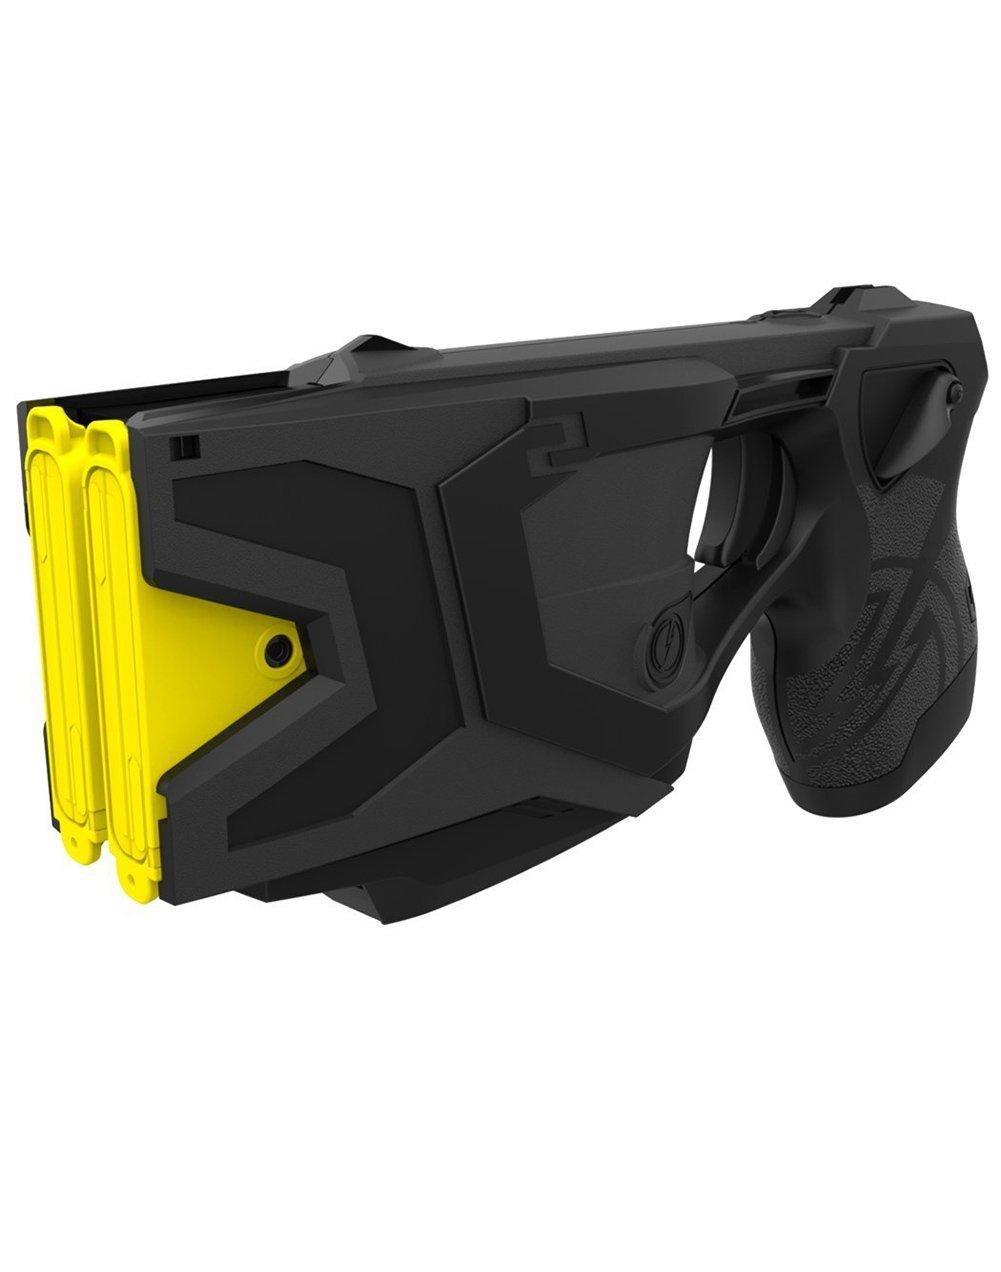 TASER X2 Self-Defense Tool Hand-Held, Black